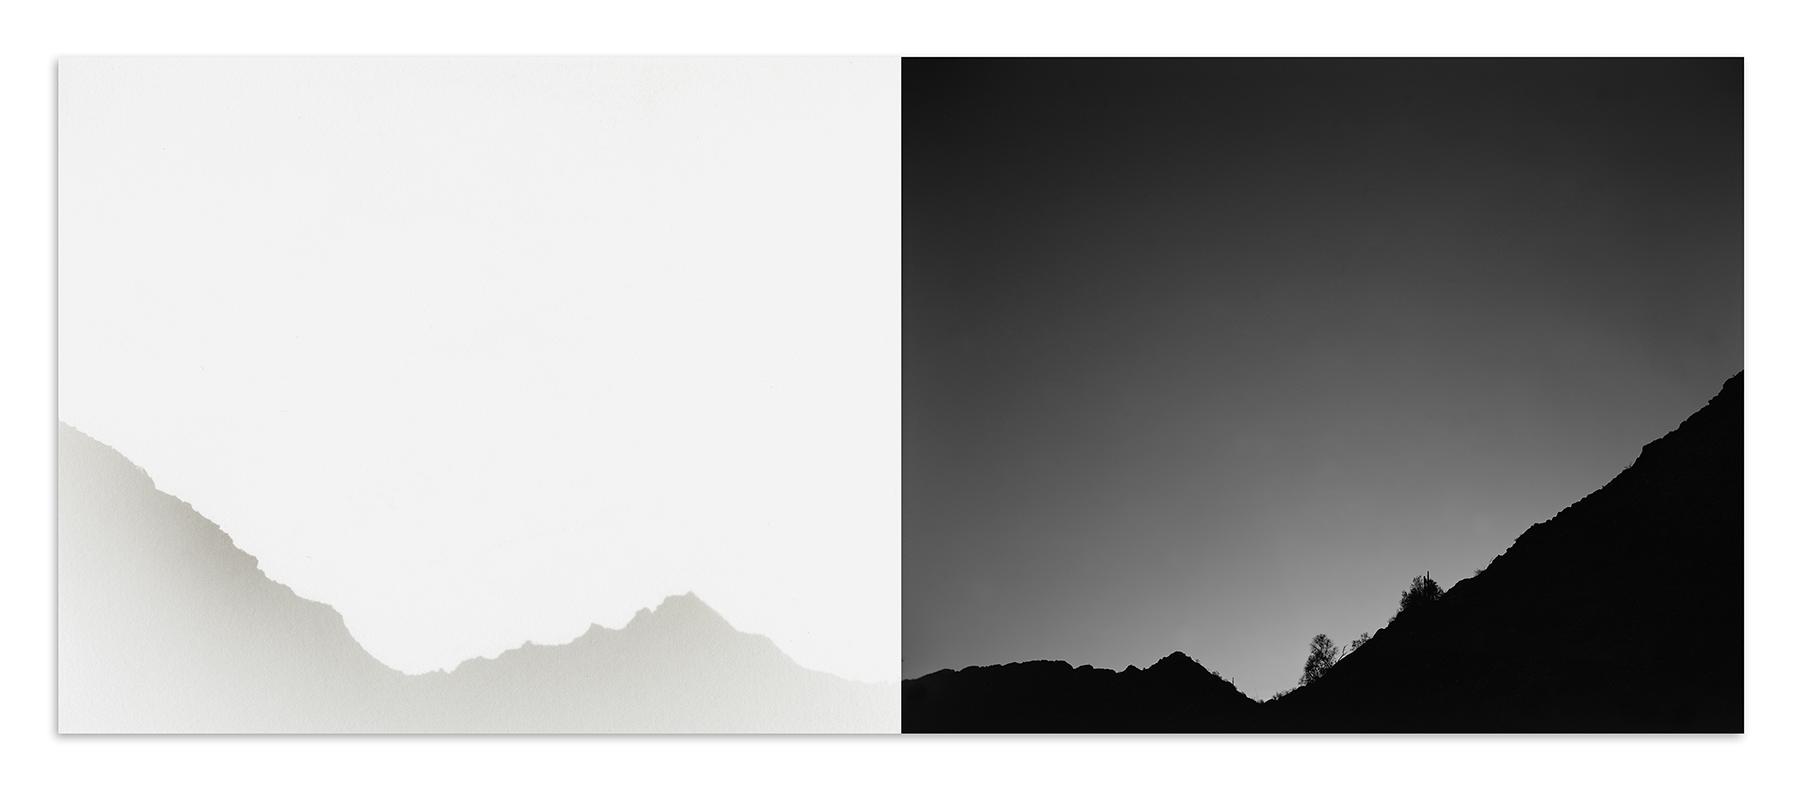 landscape, barry m. goldwater gunnery range, 2018